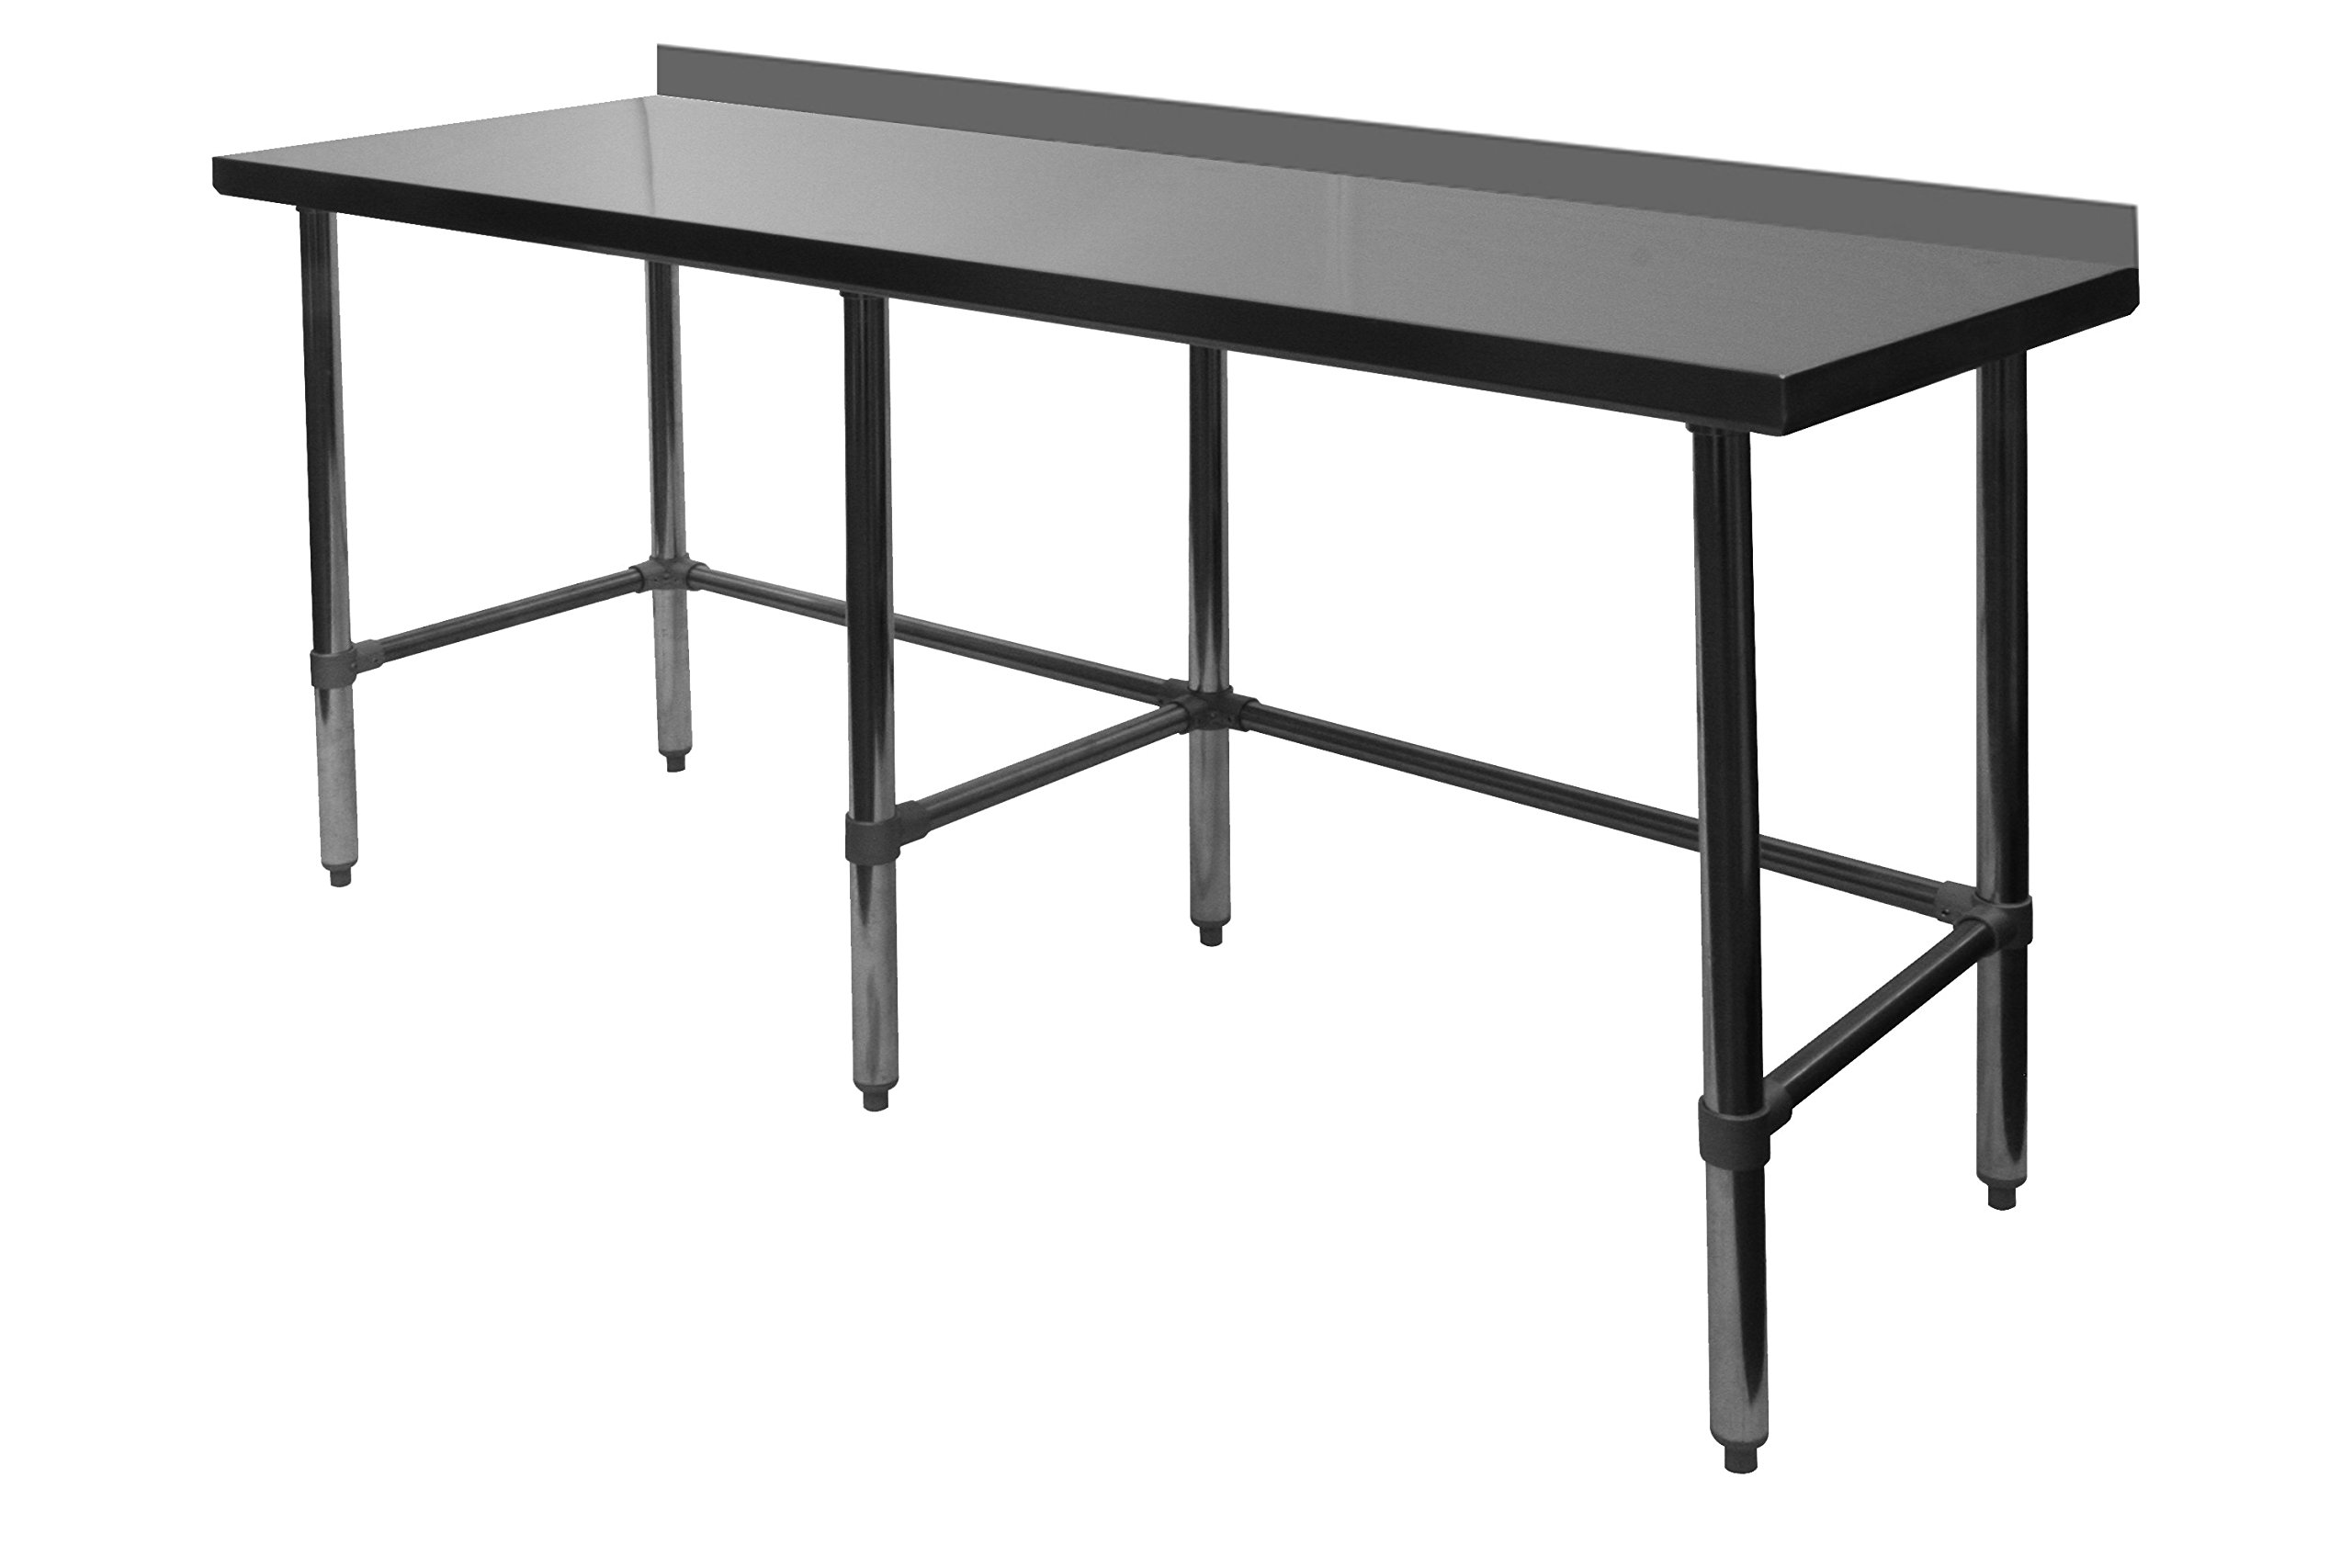 ACE Open Base All Stainless Steel Commercial Work Table w/ 4'' Backsplash 30''W x 96''L x 35''H, ETL Certified, WT-PB3096B